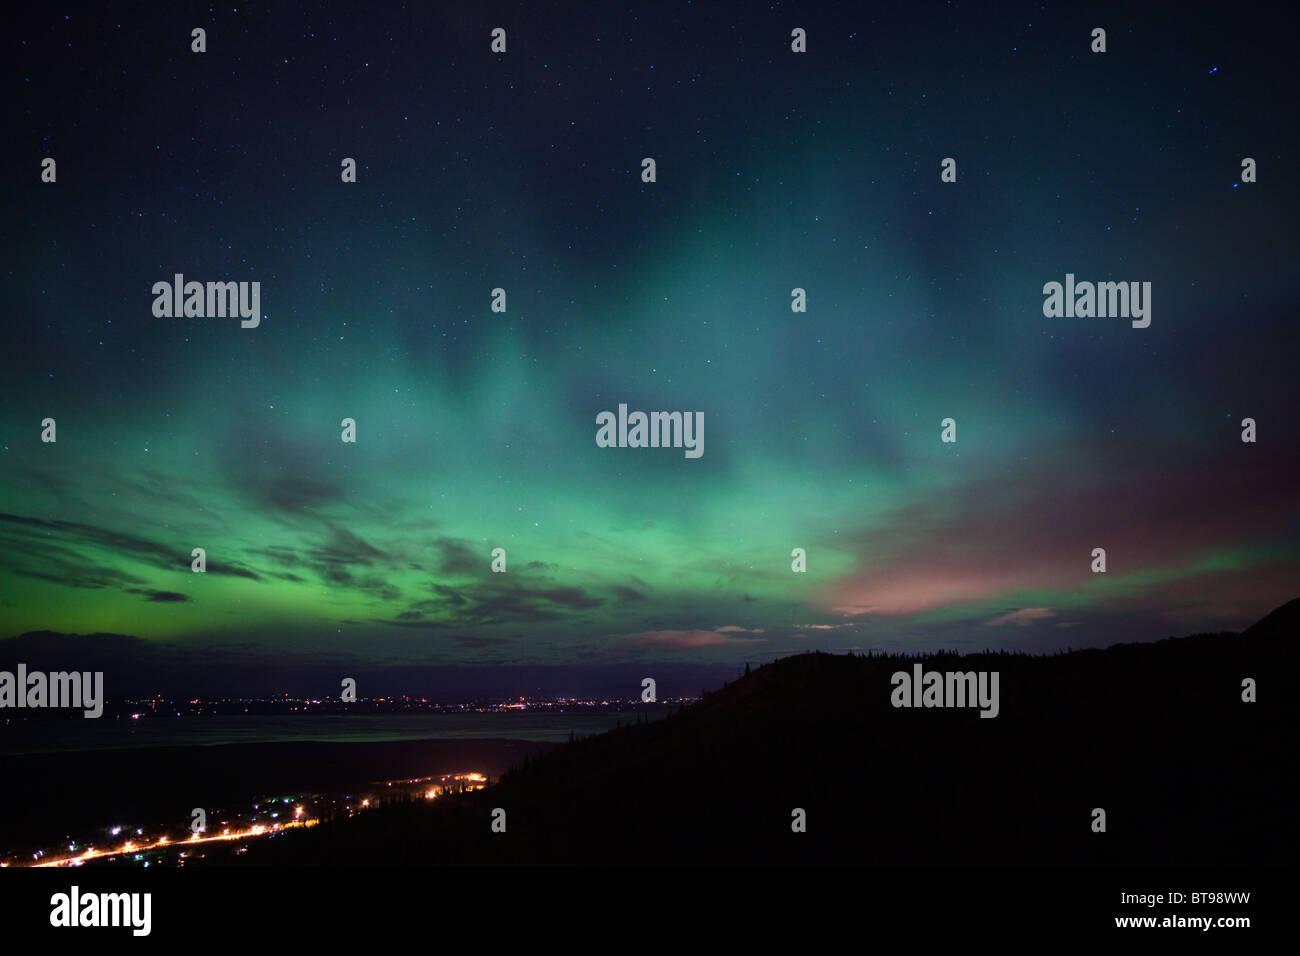 Aurora Borealis over towns in southcentral Alaska, Eagle River and Wasilla, AK - Stock Image